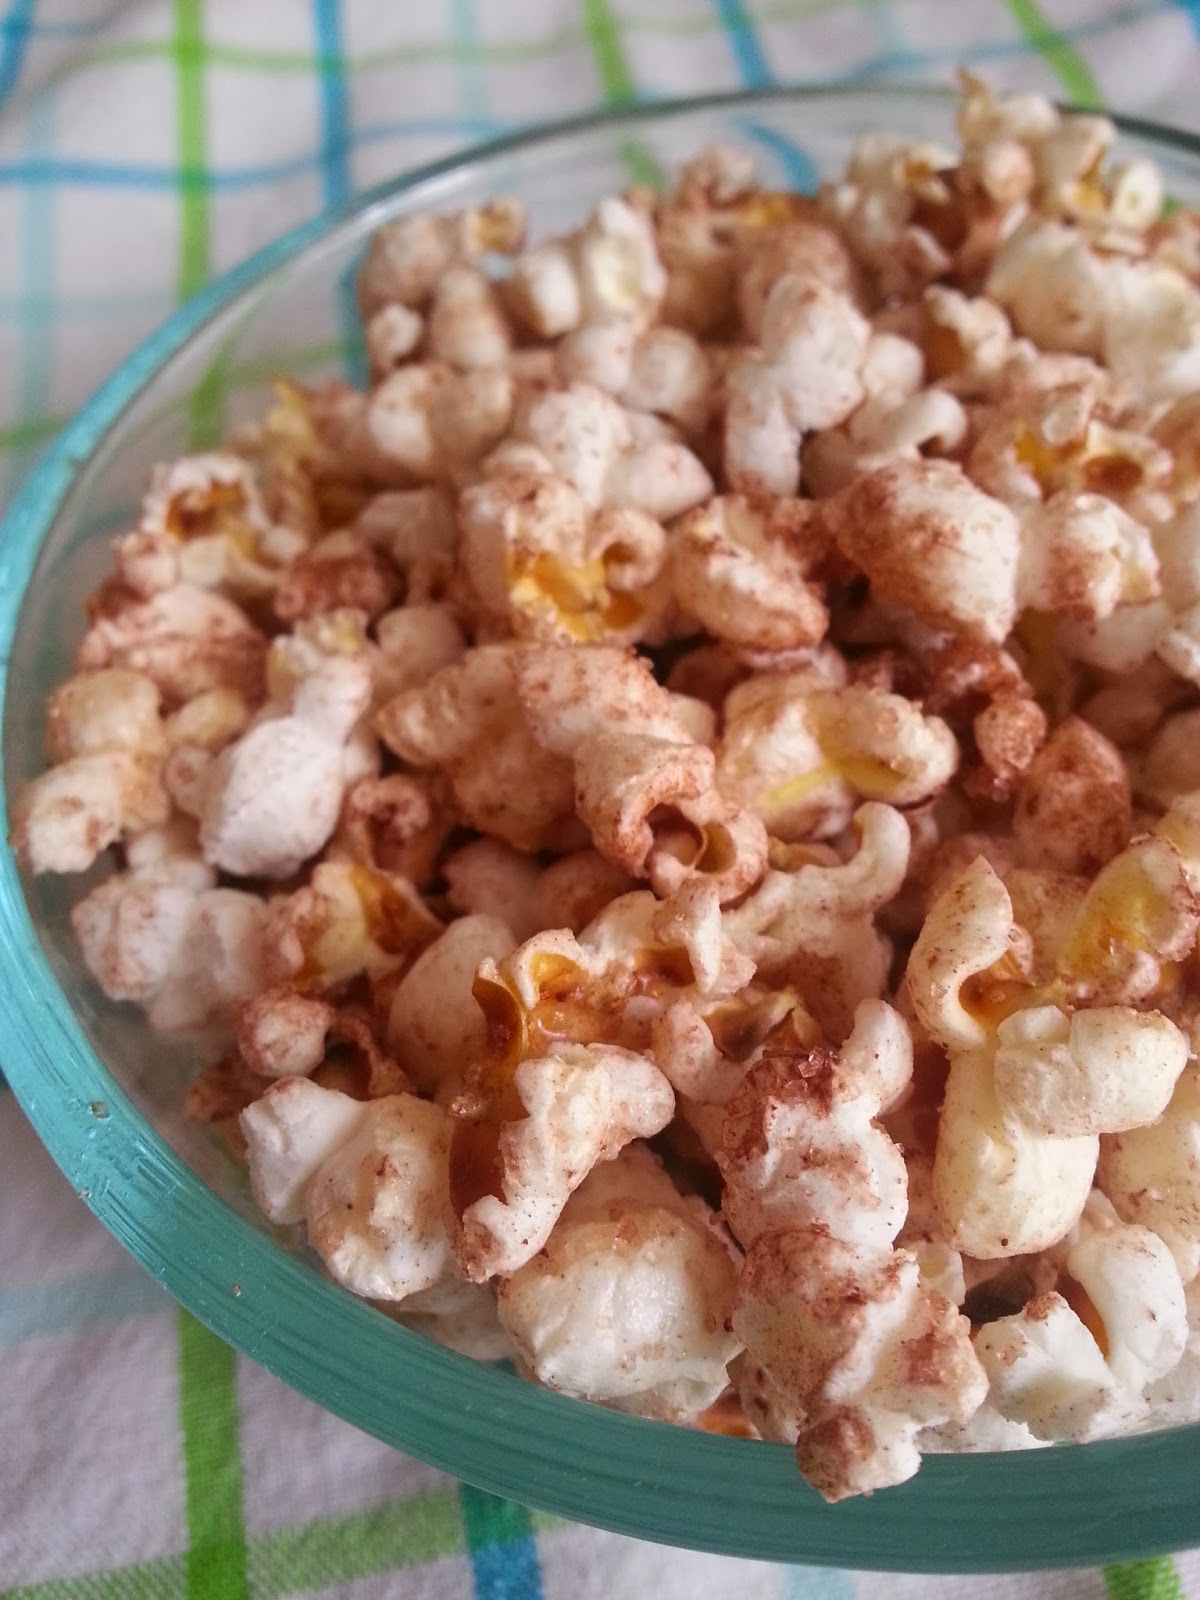 Dairy-free chocolate popcorn